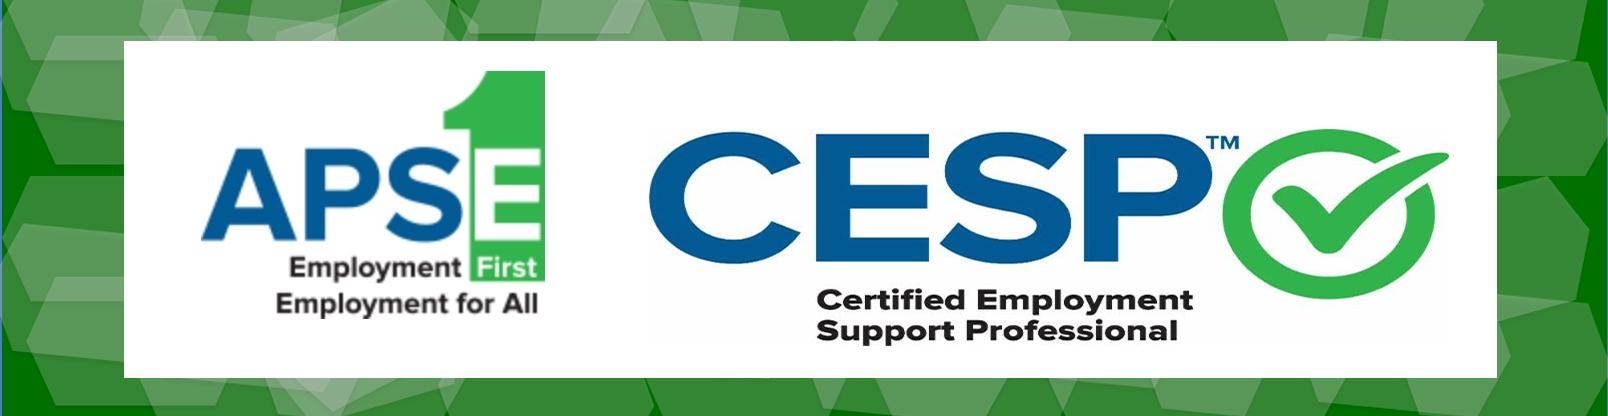 APSE-CESP logos